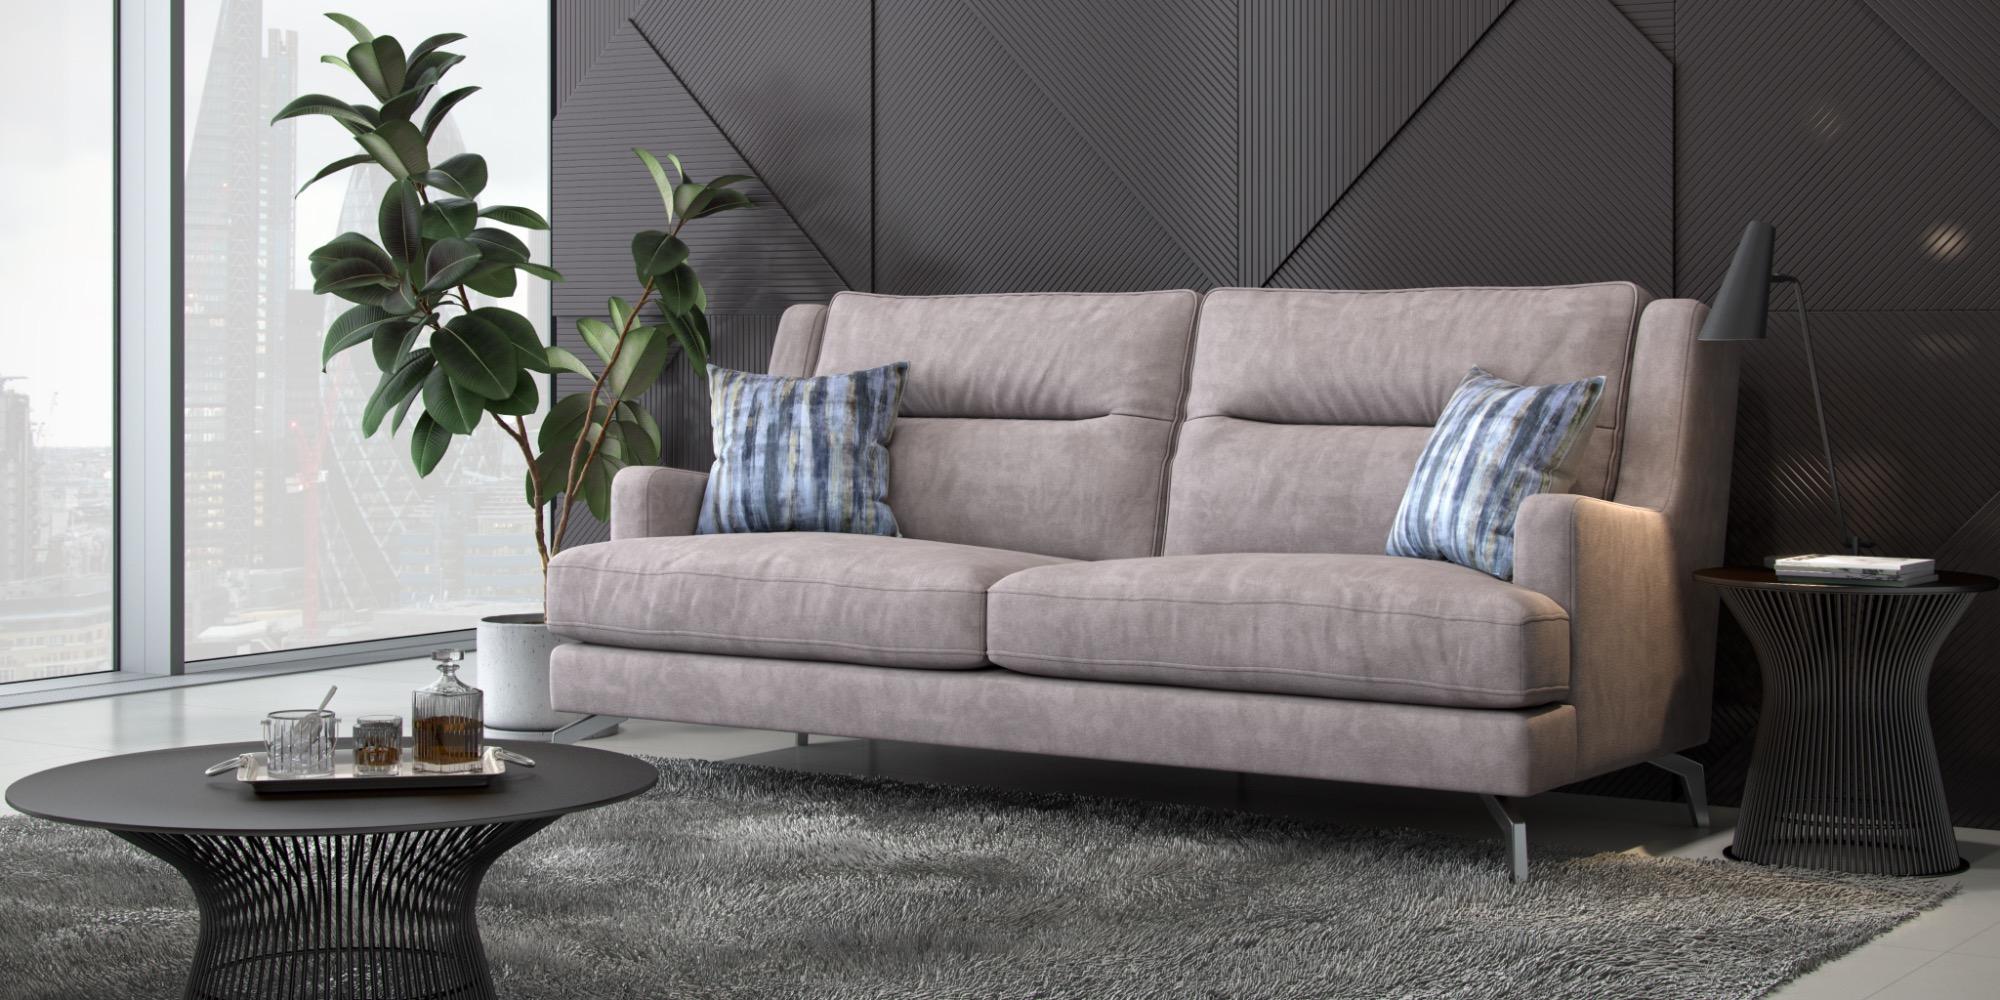 Buoyant Upholstery - PARKER